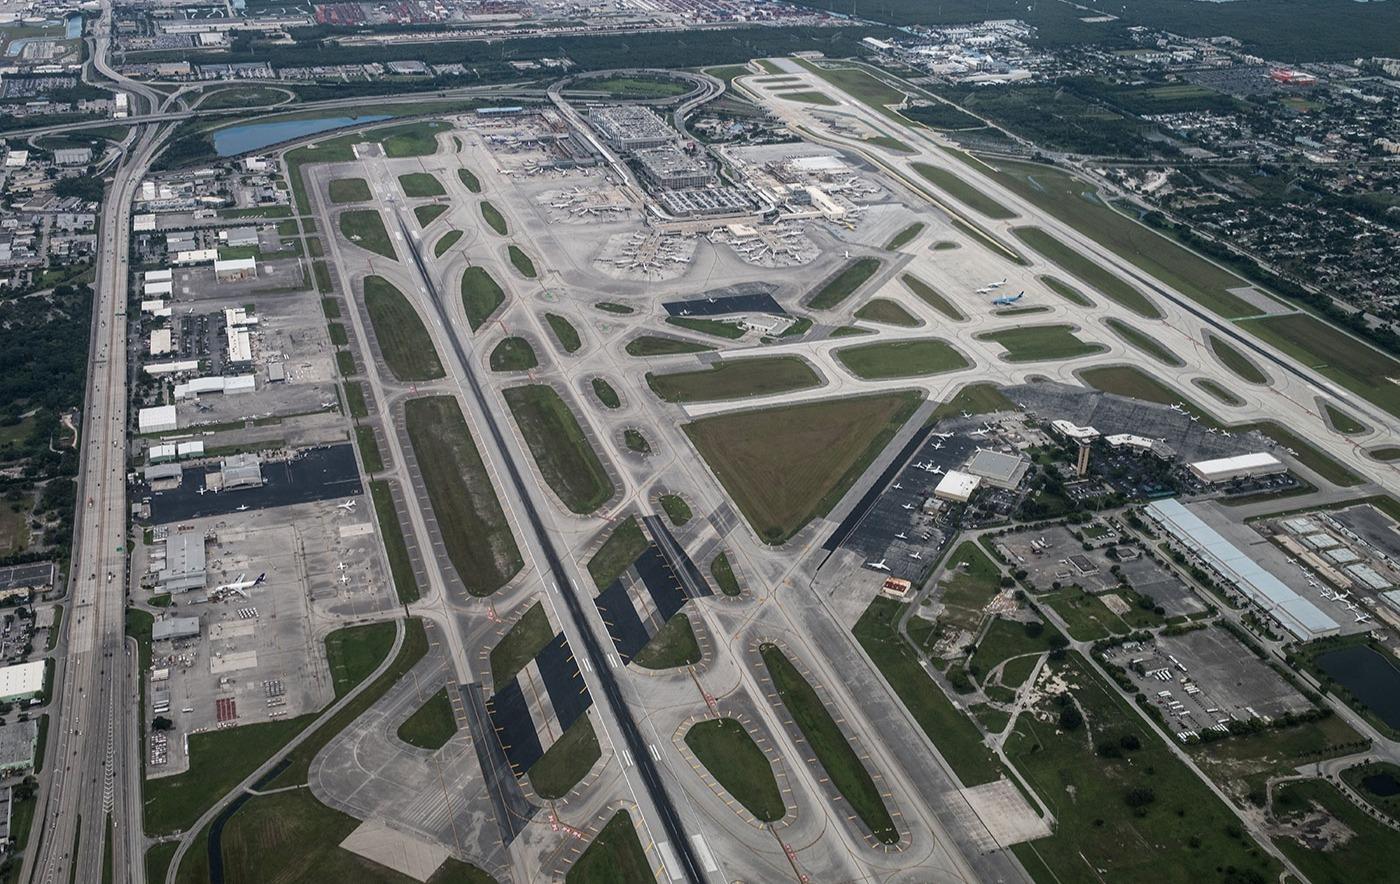 Fort Lauderdale International Airport